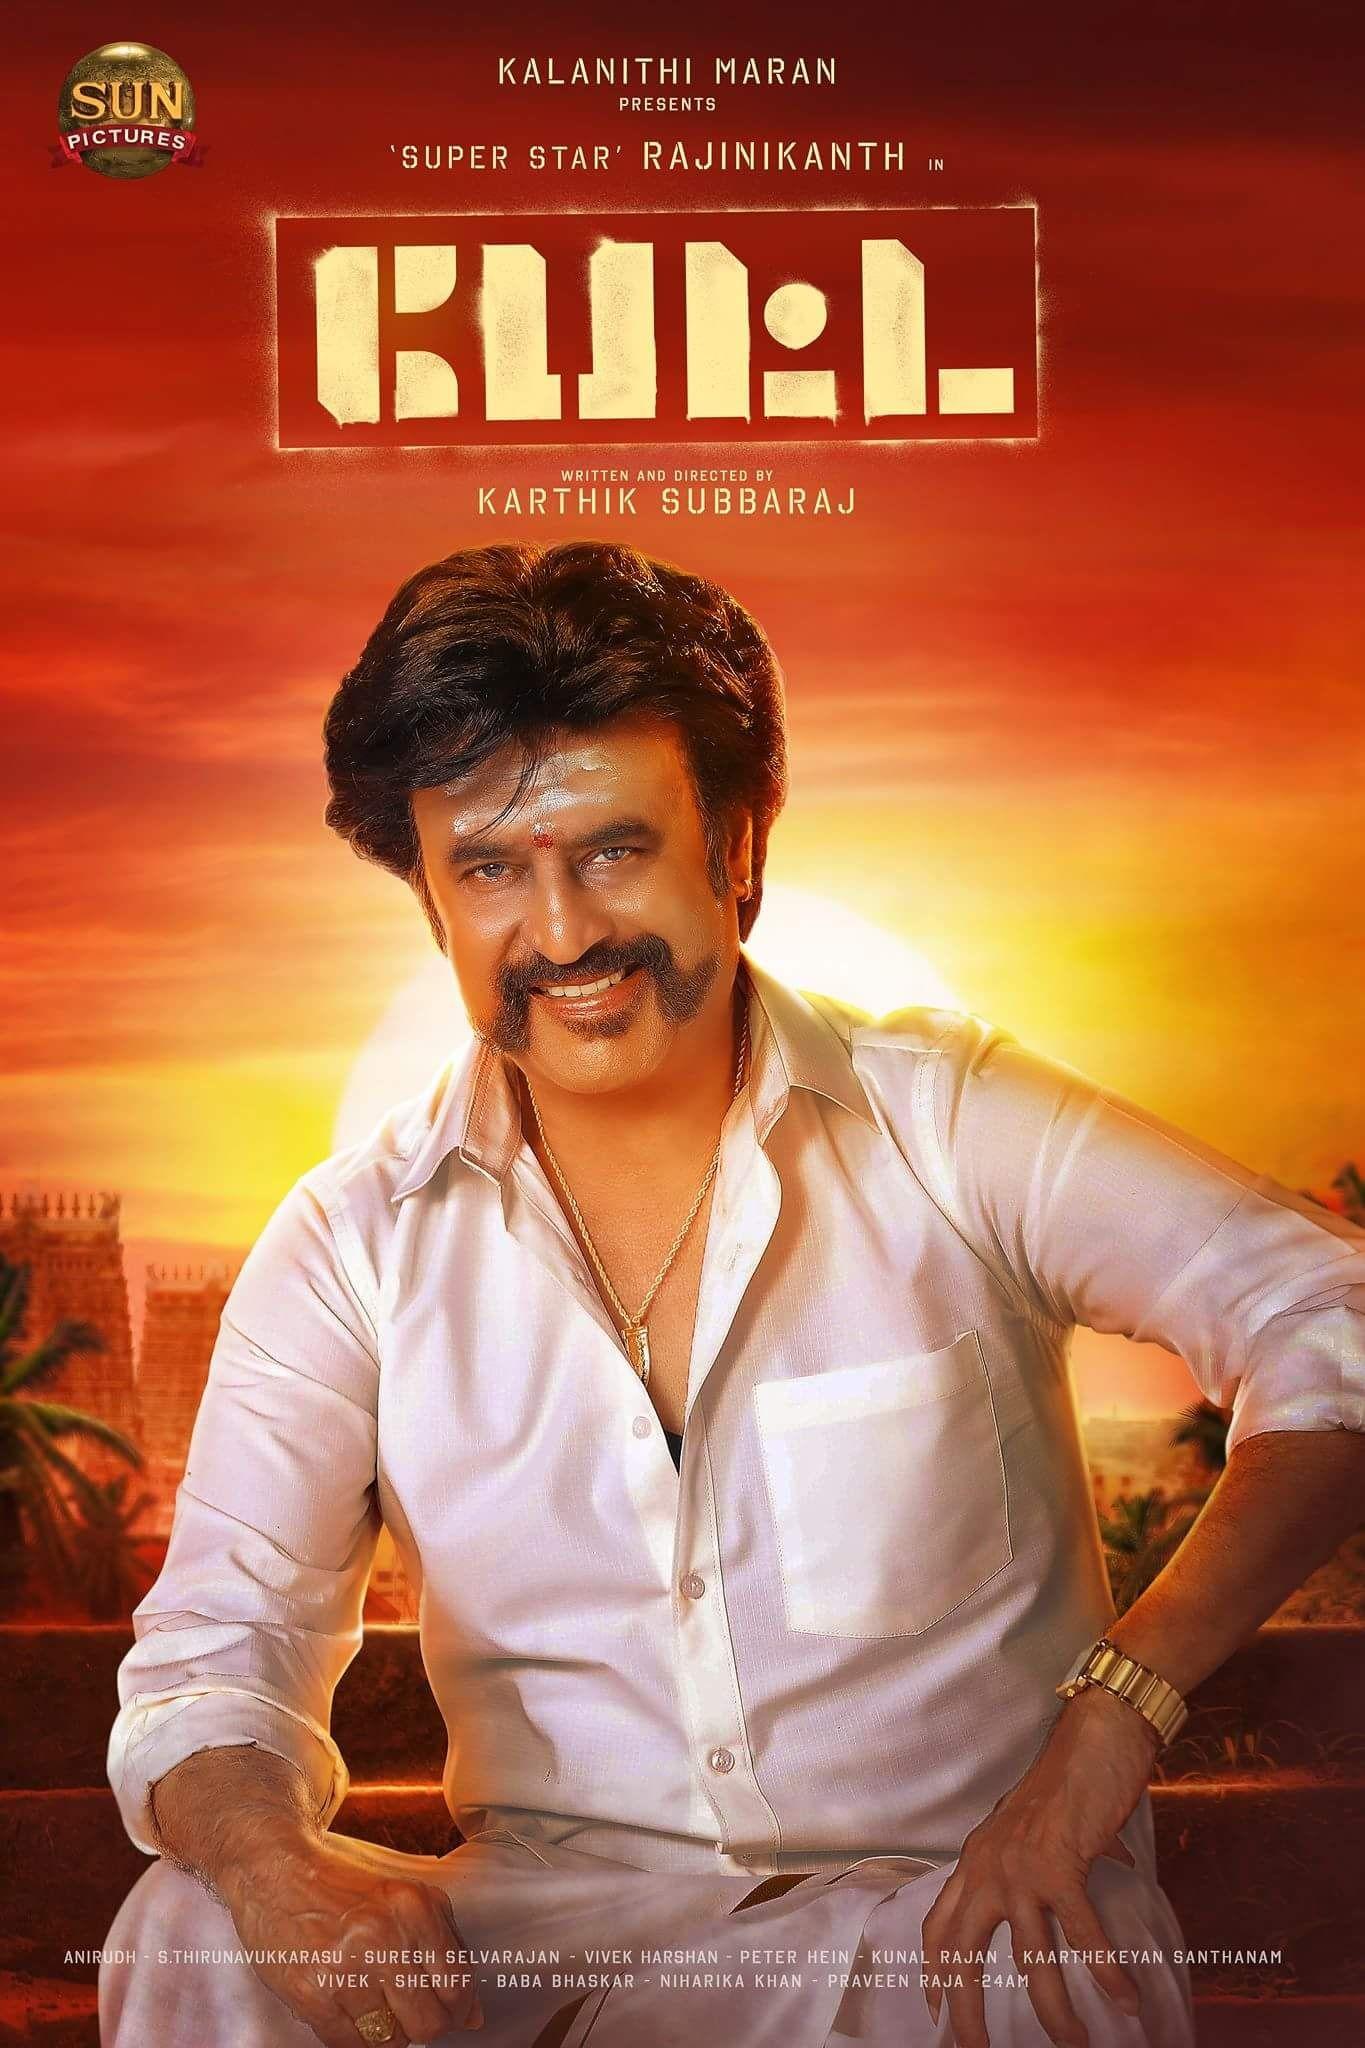 Petta Tamil Movie Dvd Release Date Full Movies Tamil Movies Dvd Release